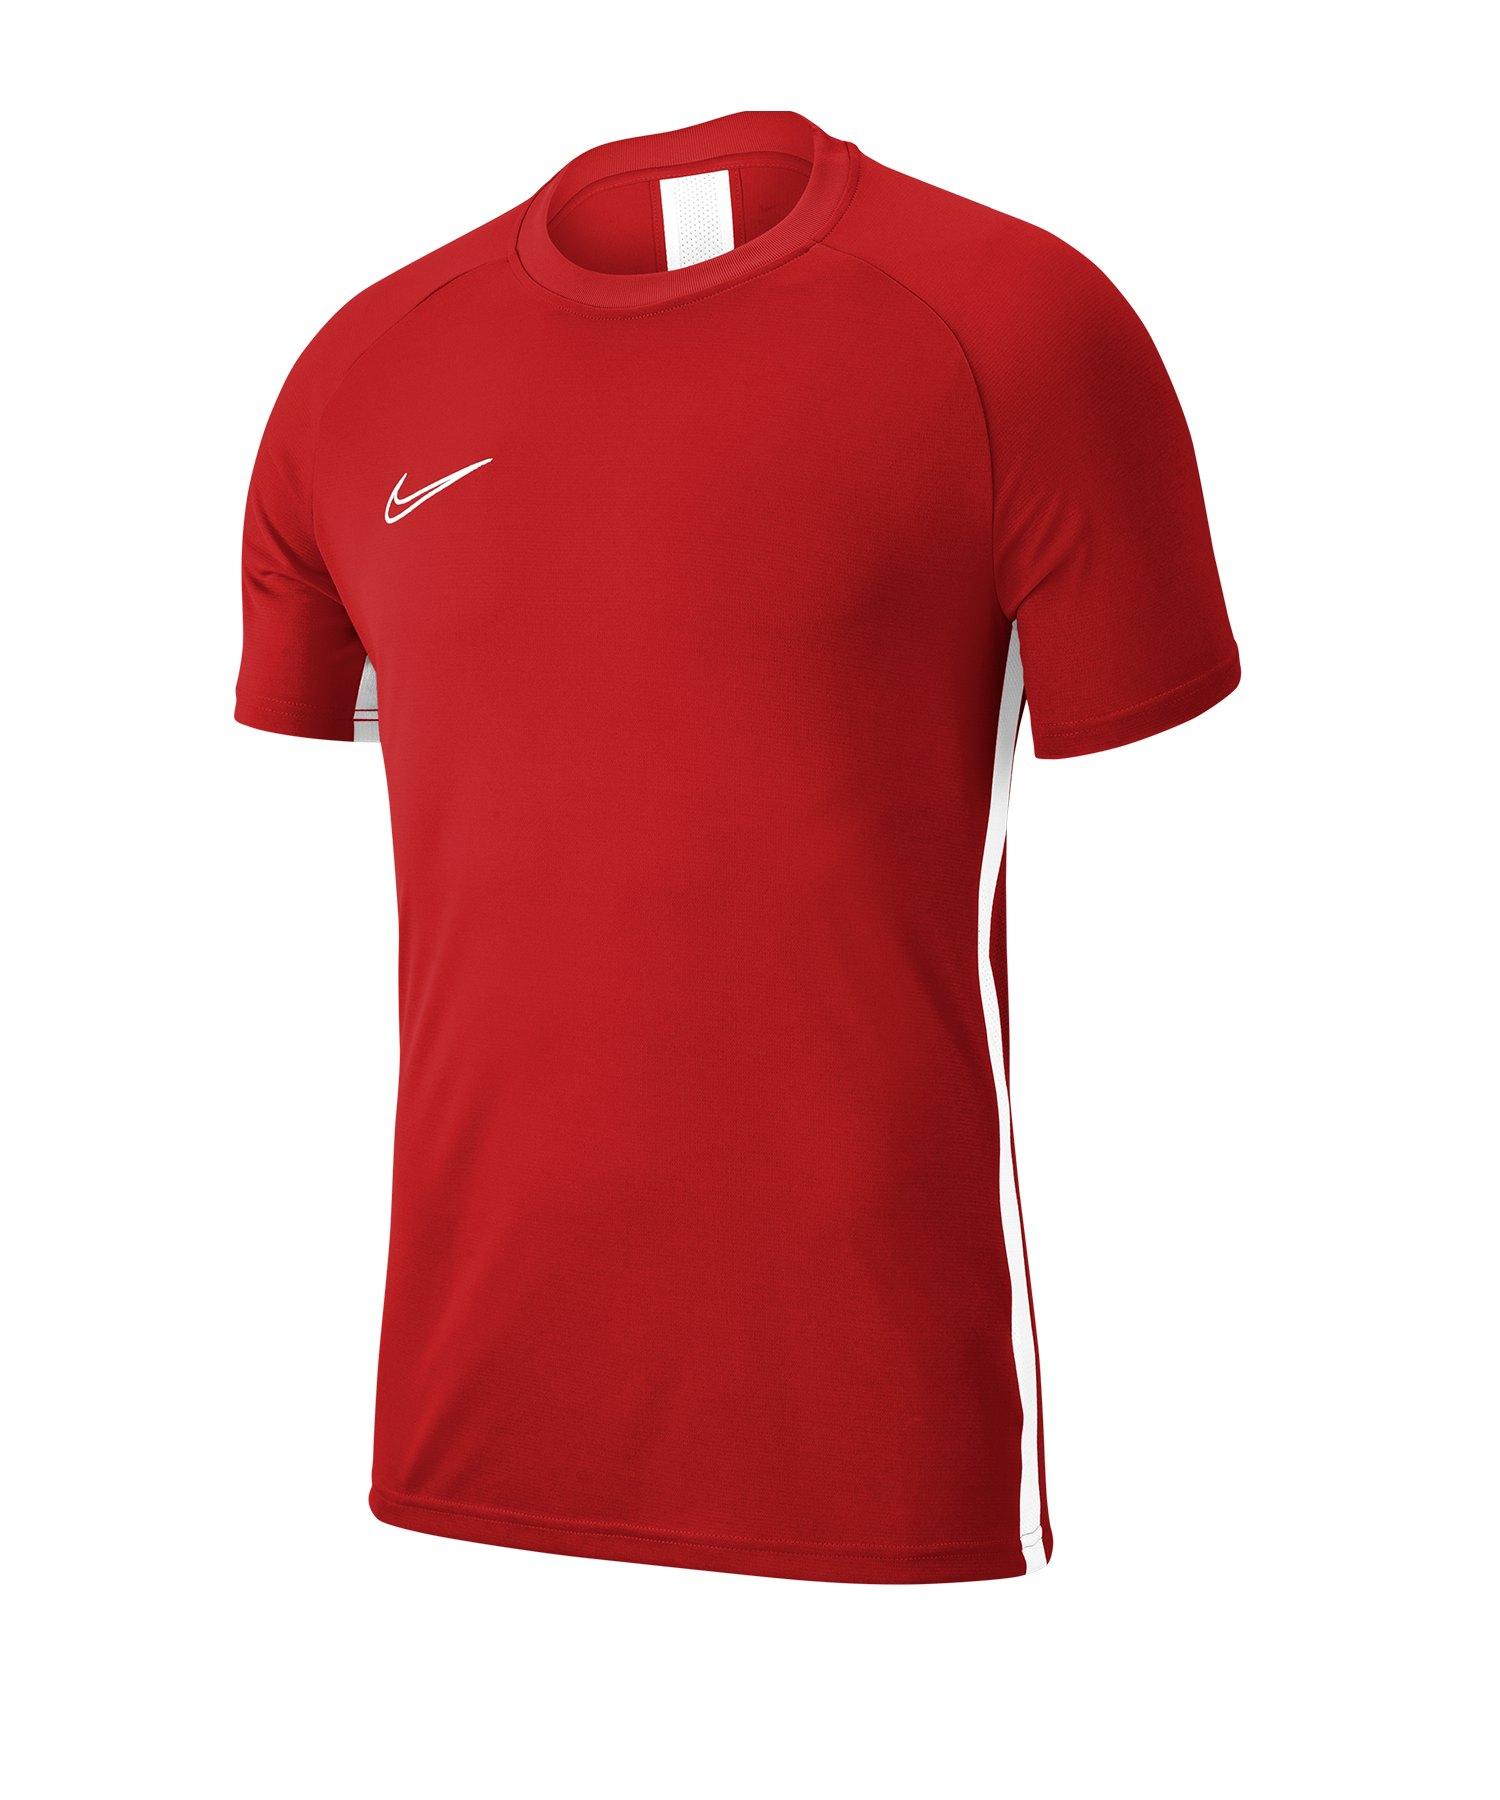 Nike Academy 19 Trainingstop T-Shirt Rot F657 - rot